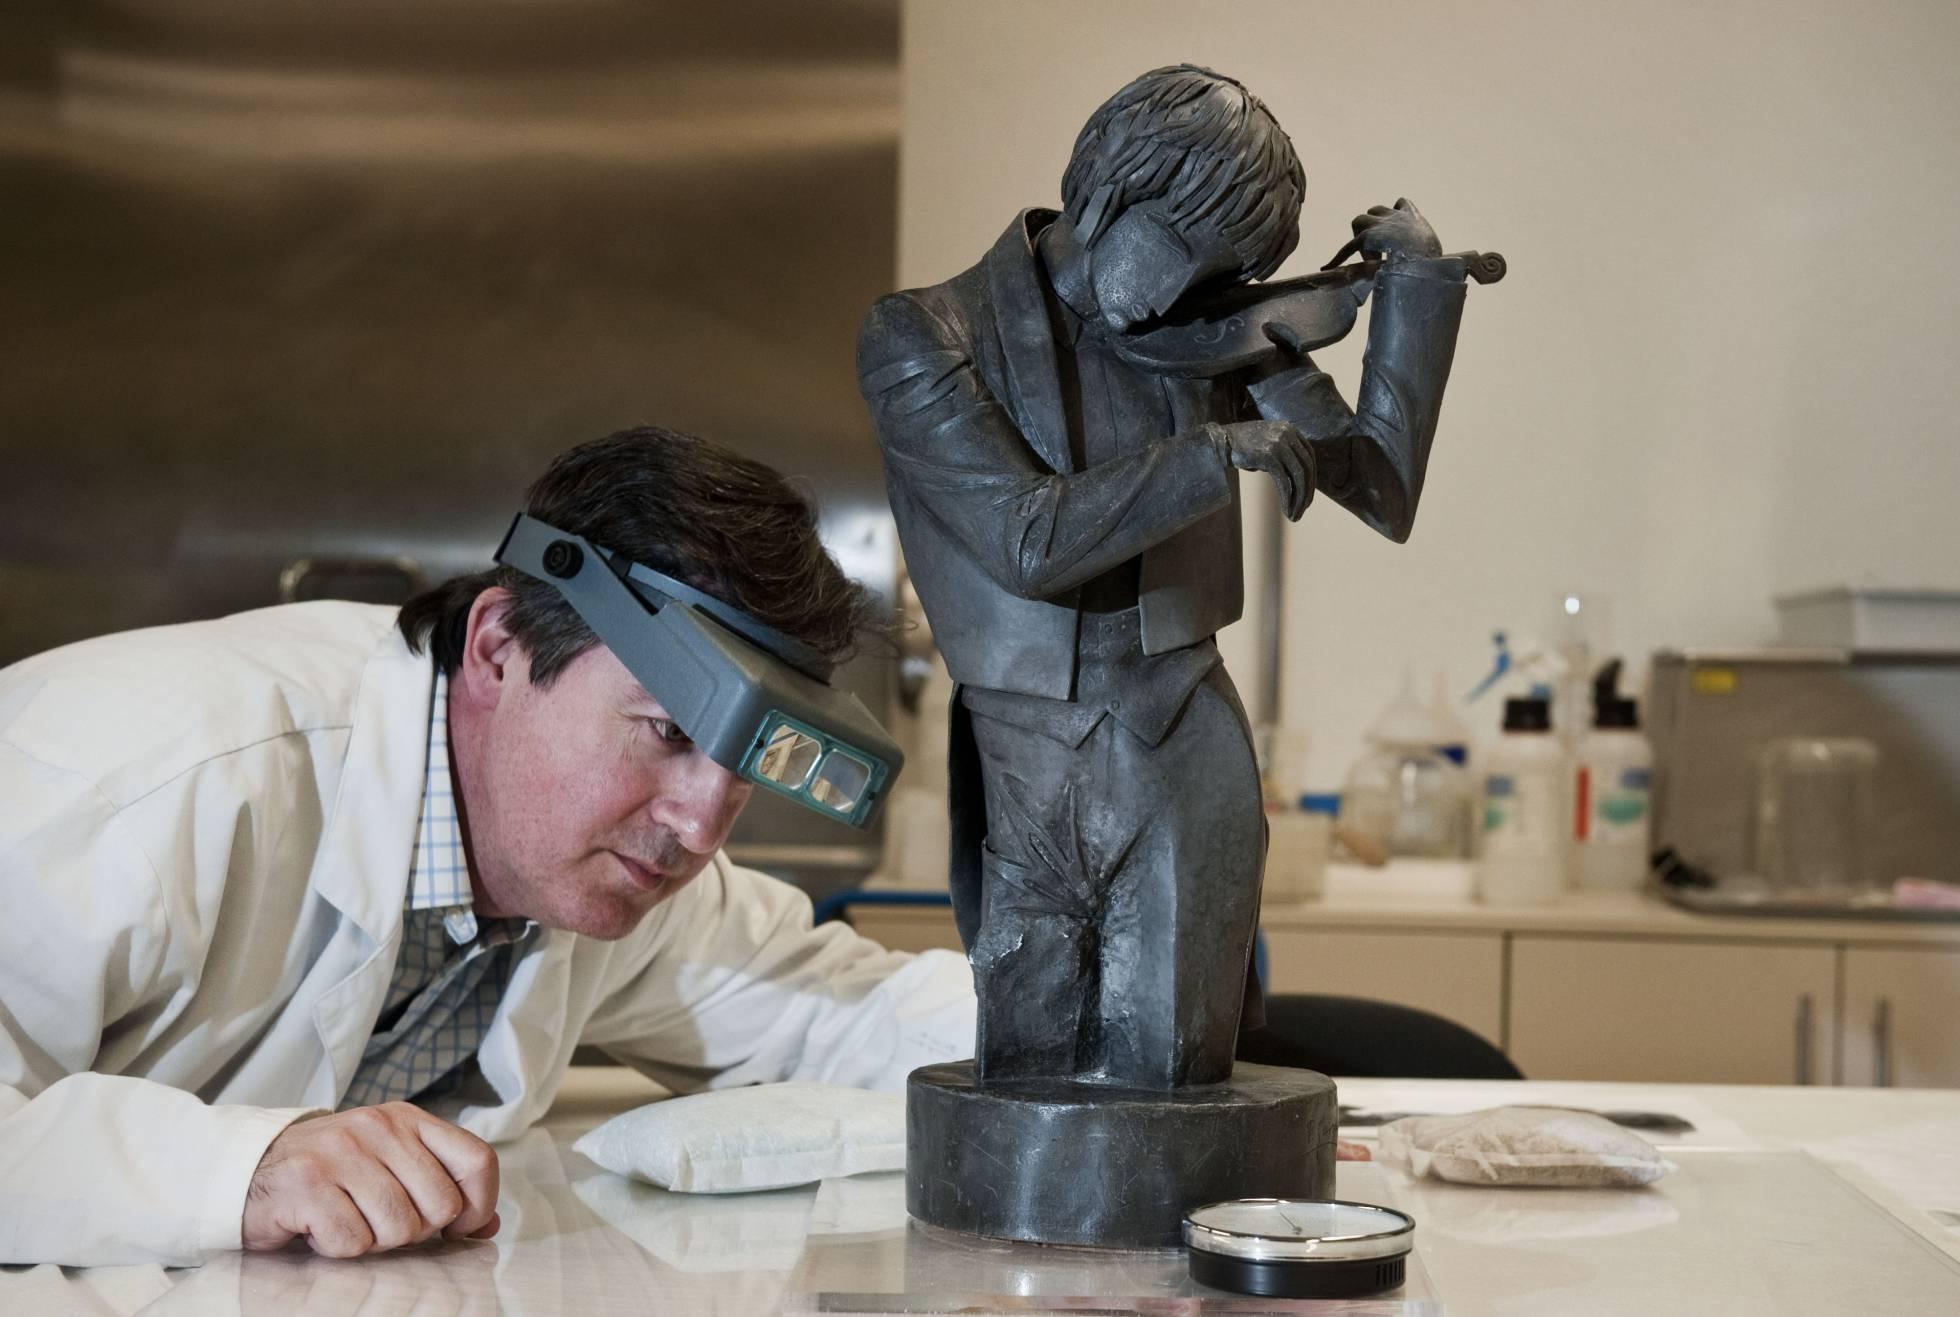 Àlex Masalles examining the sculpture